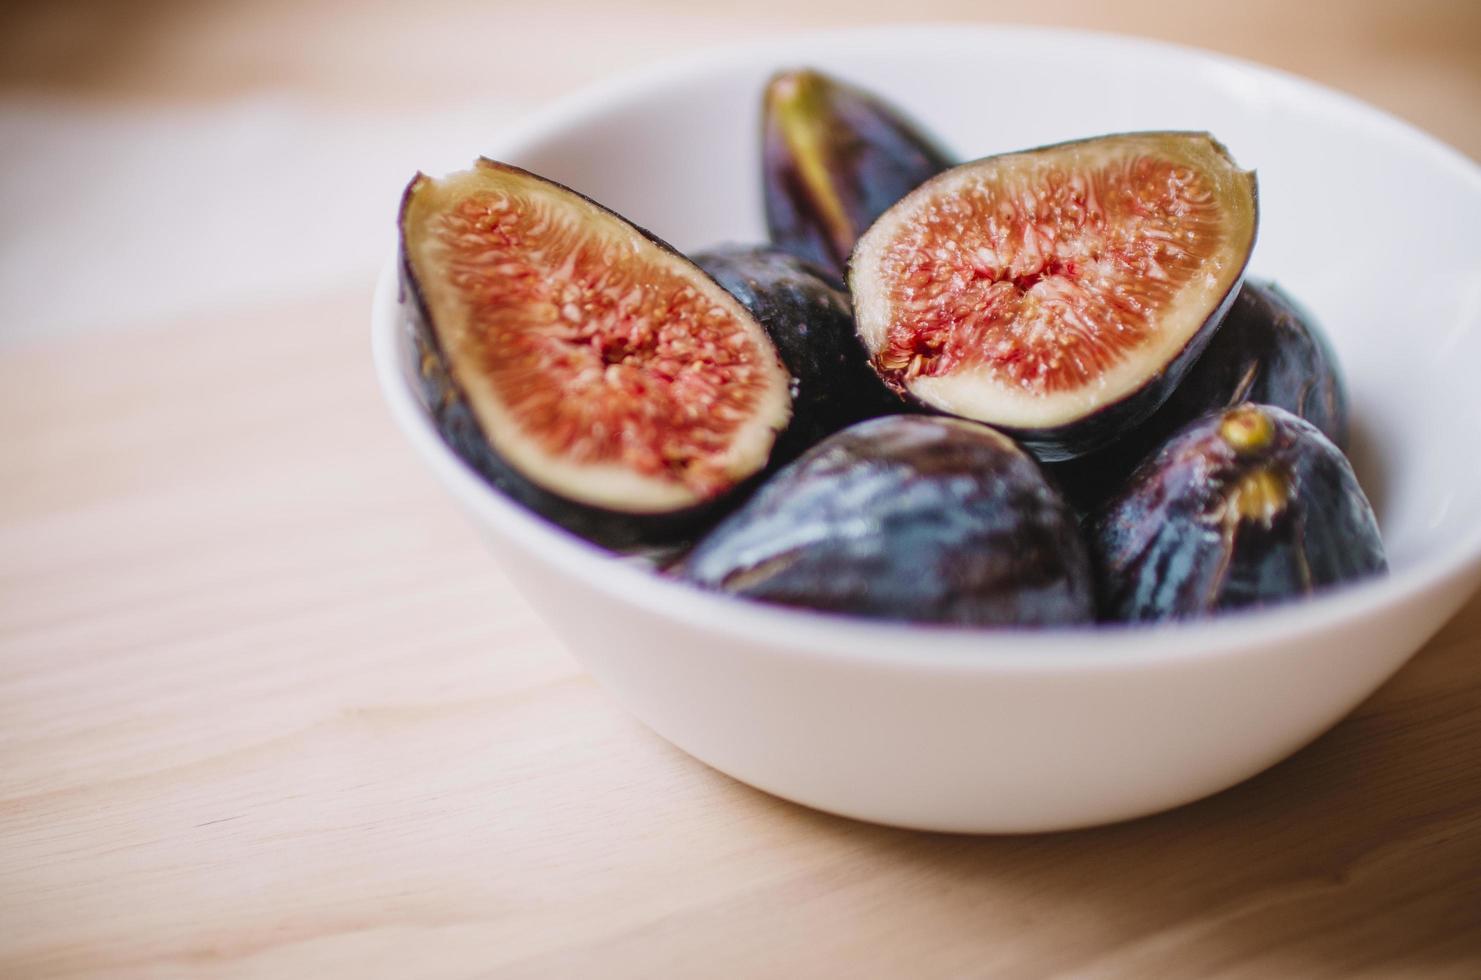 tranches de fruits dans un bol en céramique photo